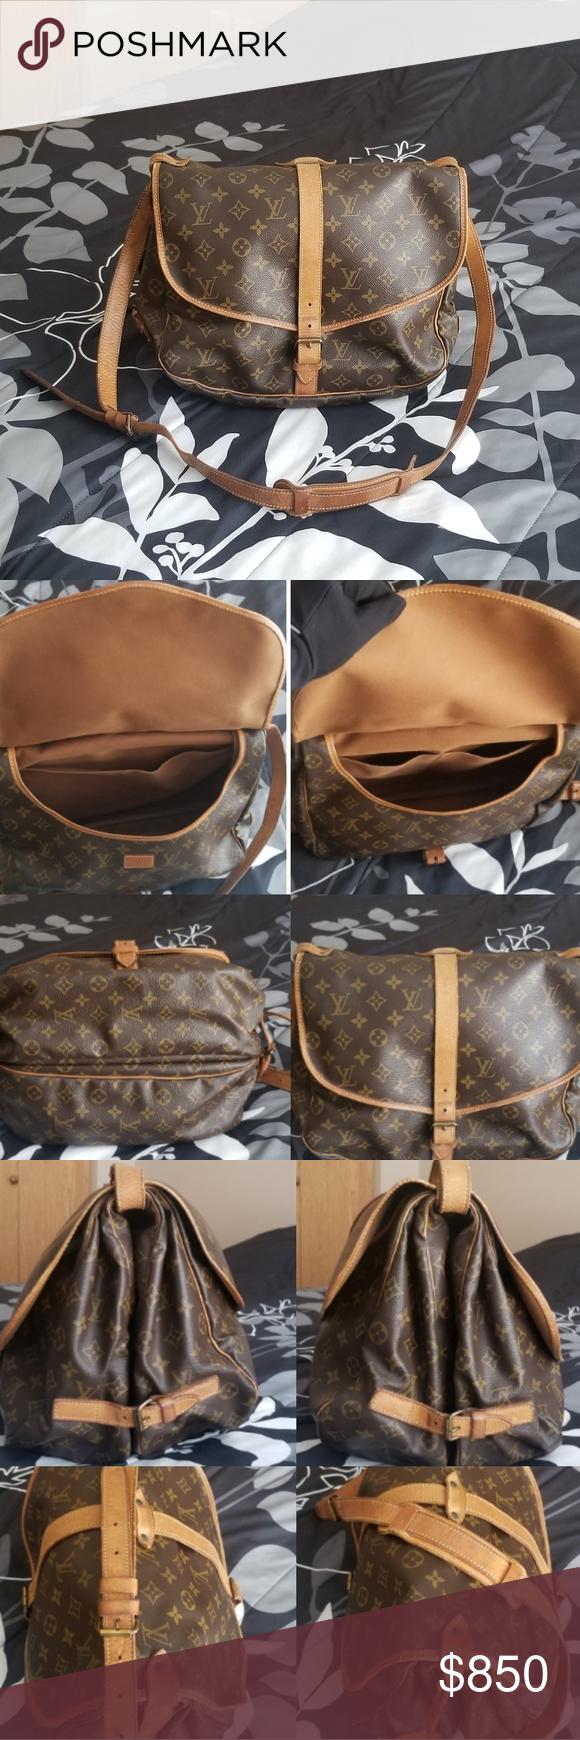 LOUIS VUITTON BAG(SAUMUR35) Authentic Preloved,Vintage For